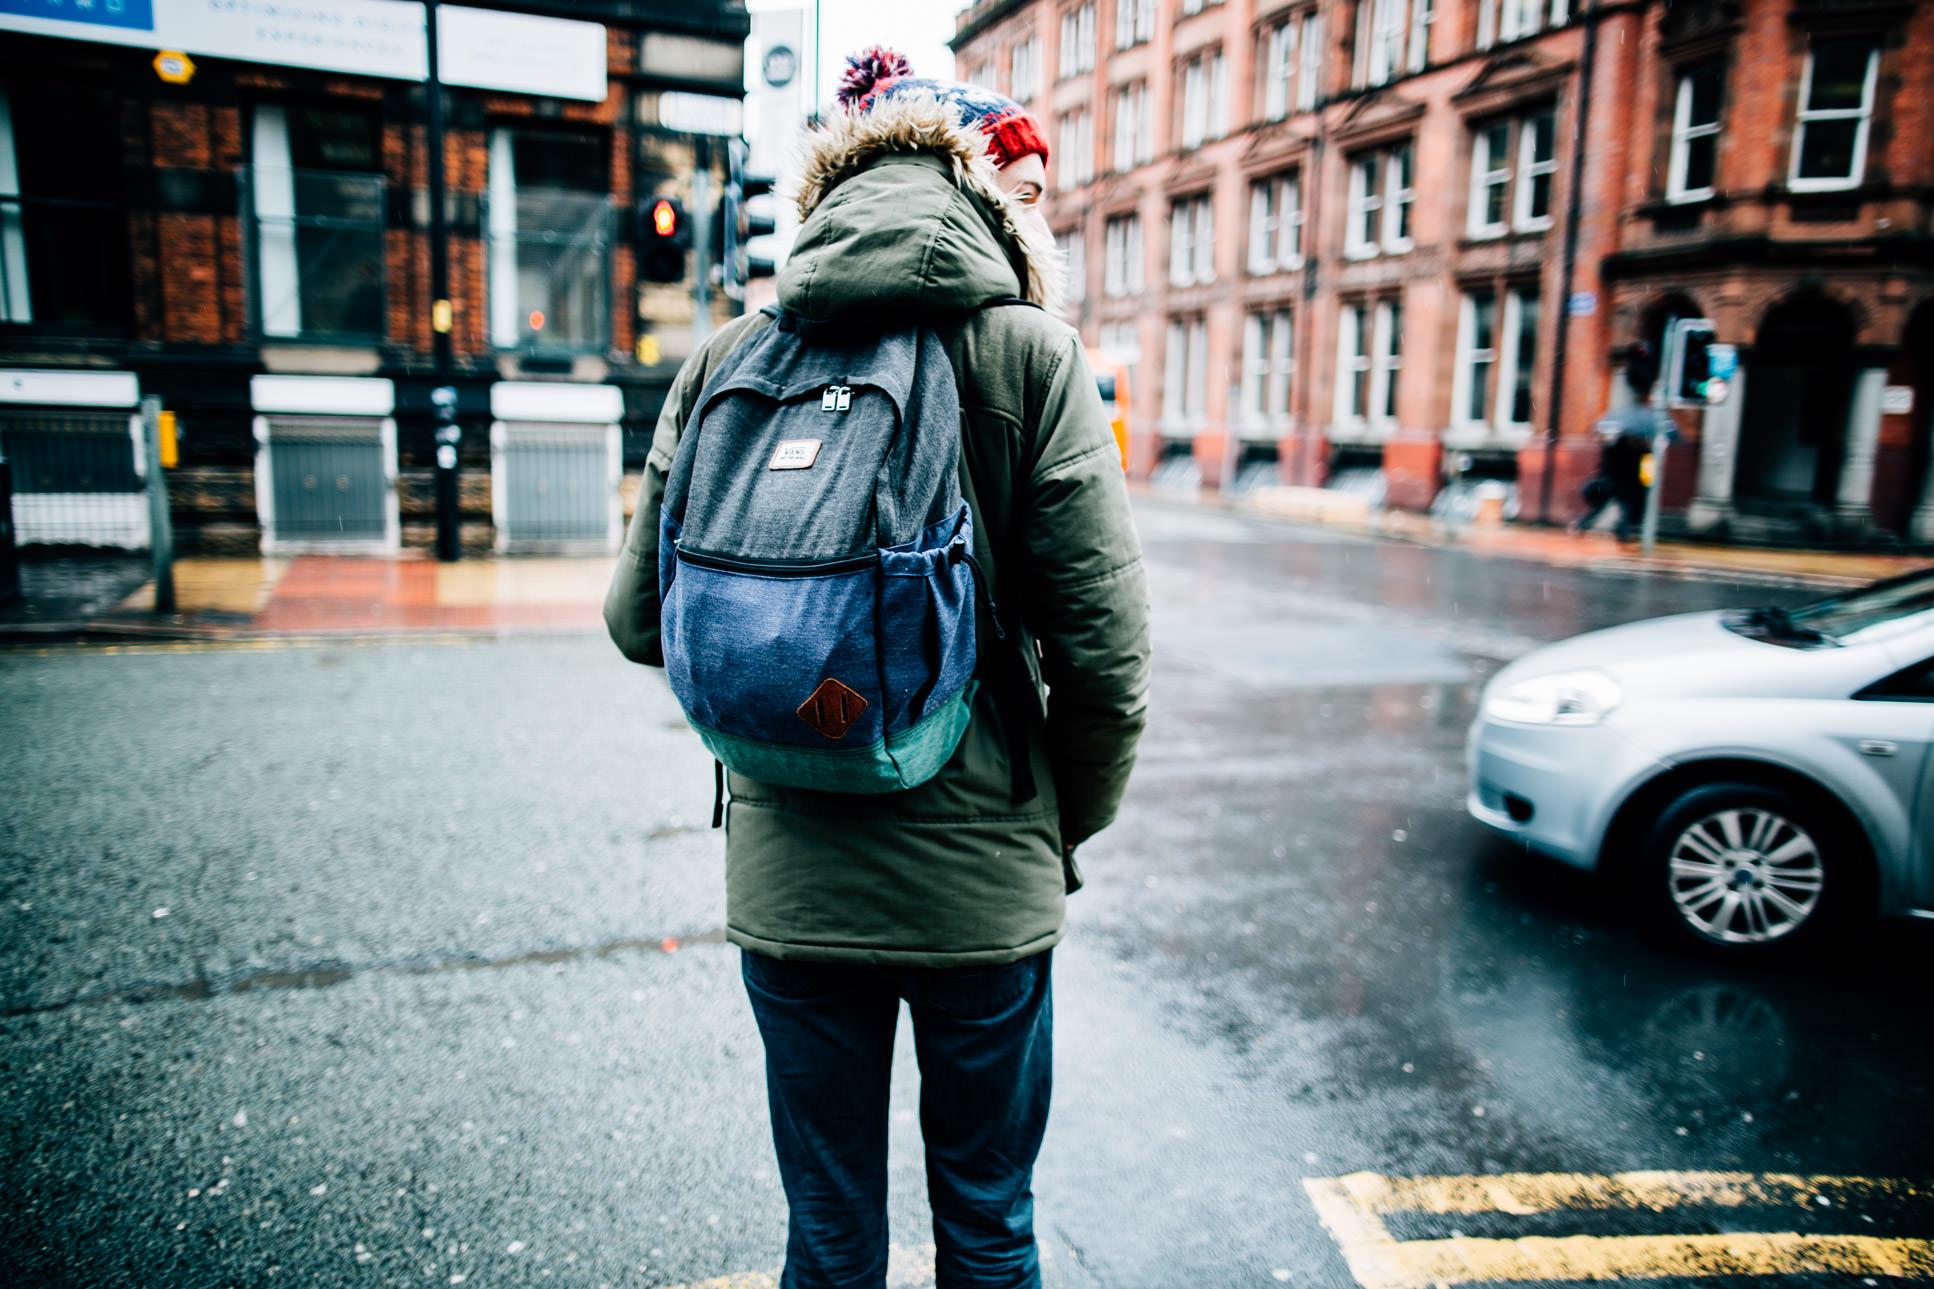 Street Photography8